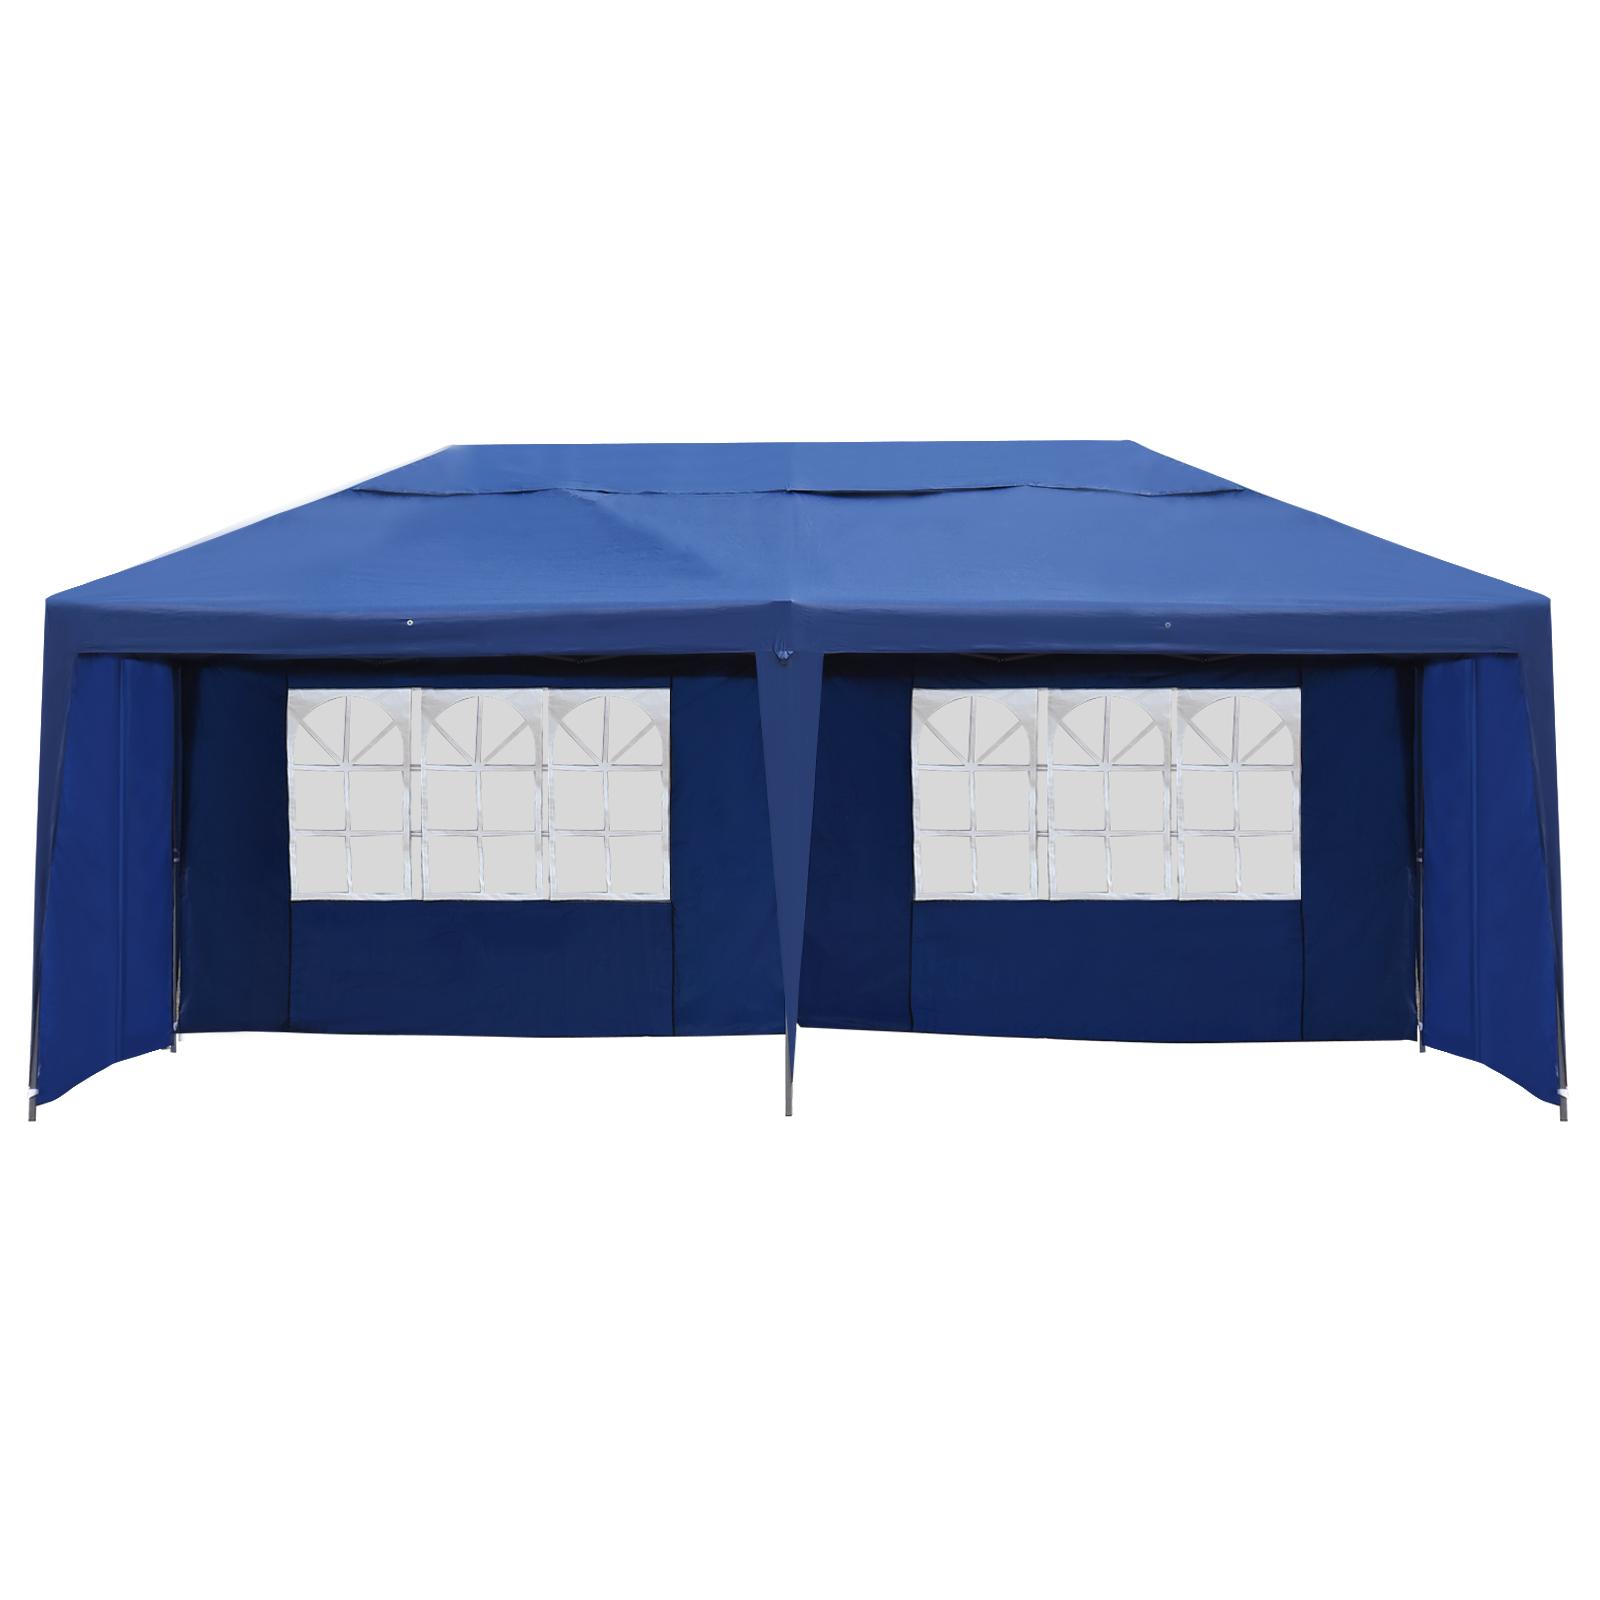 Outdoor-10-039-x20-039-EZ-POP-UP-Gazebo-Wedding-Party-Tent-Canopy-Folding-w-Carry-Bag thumbnail 4